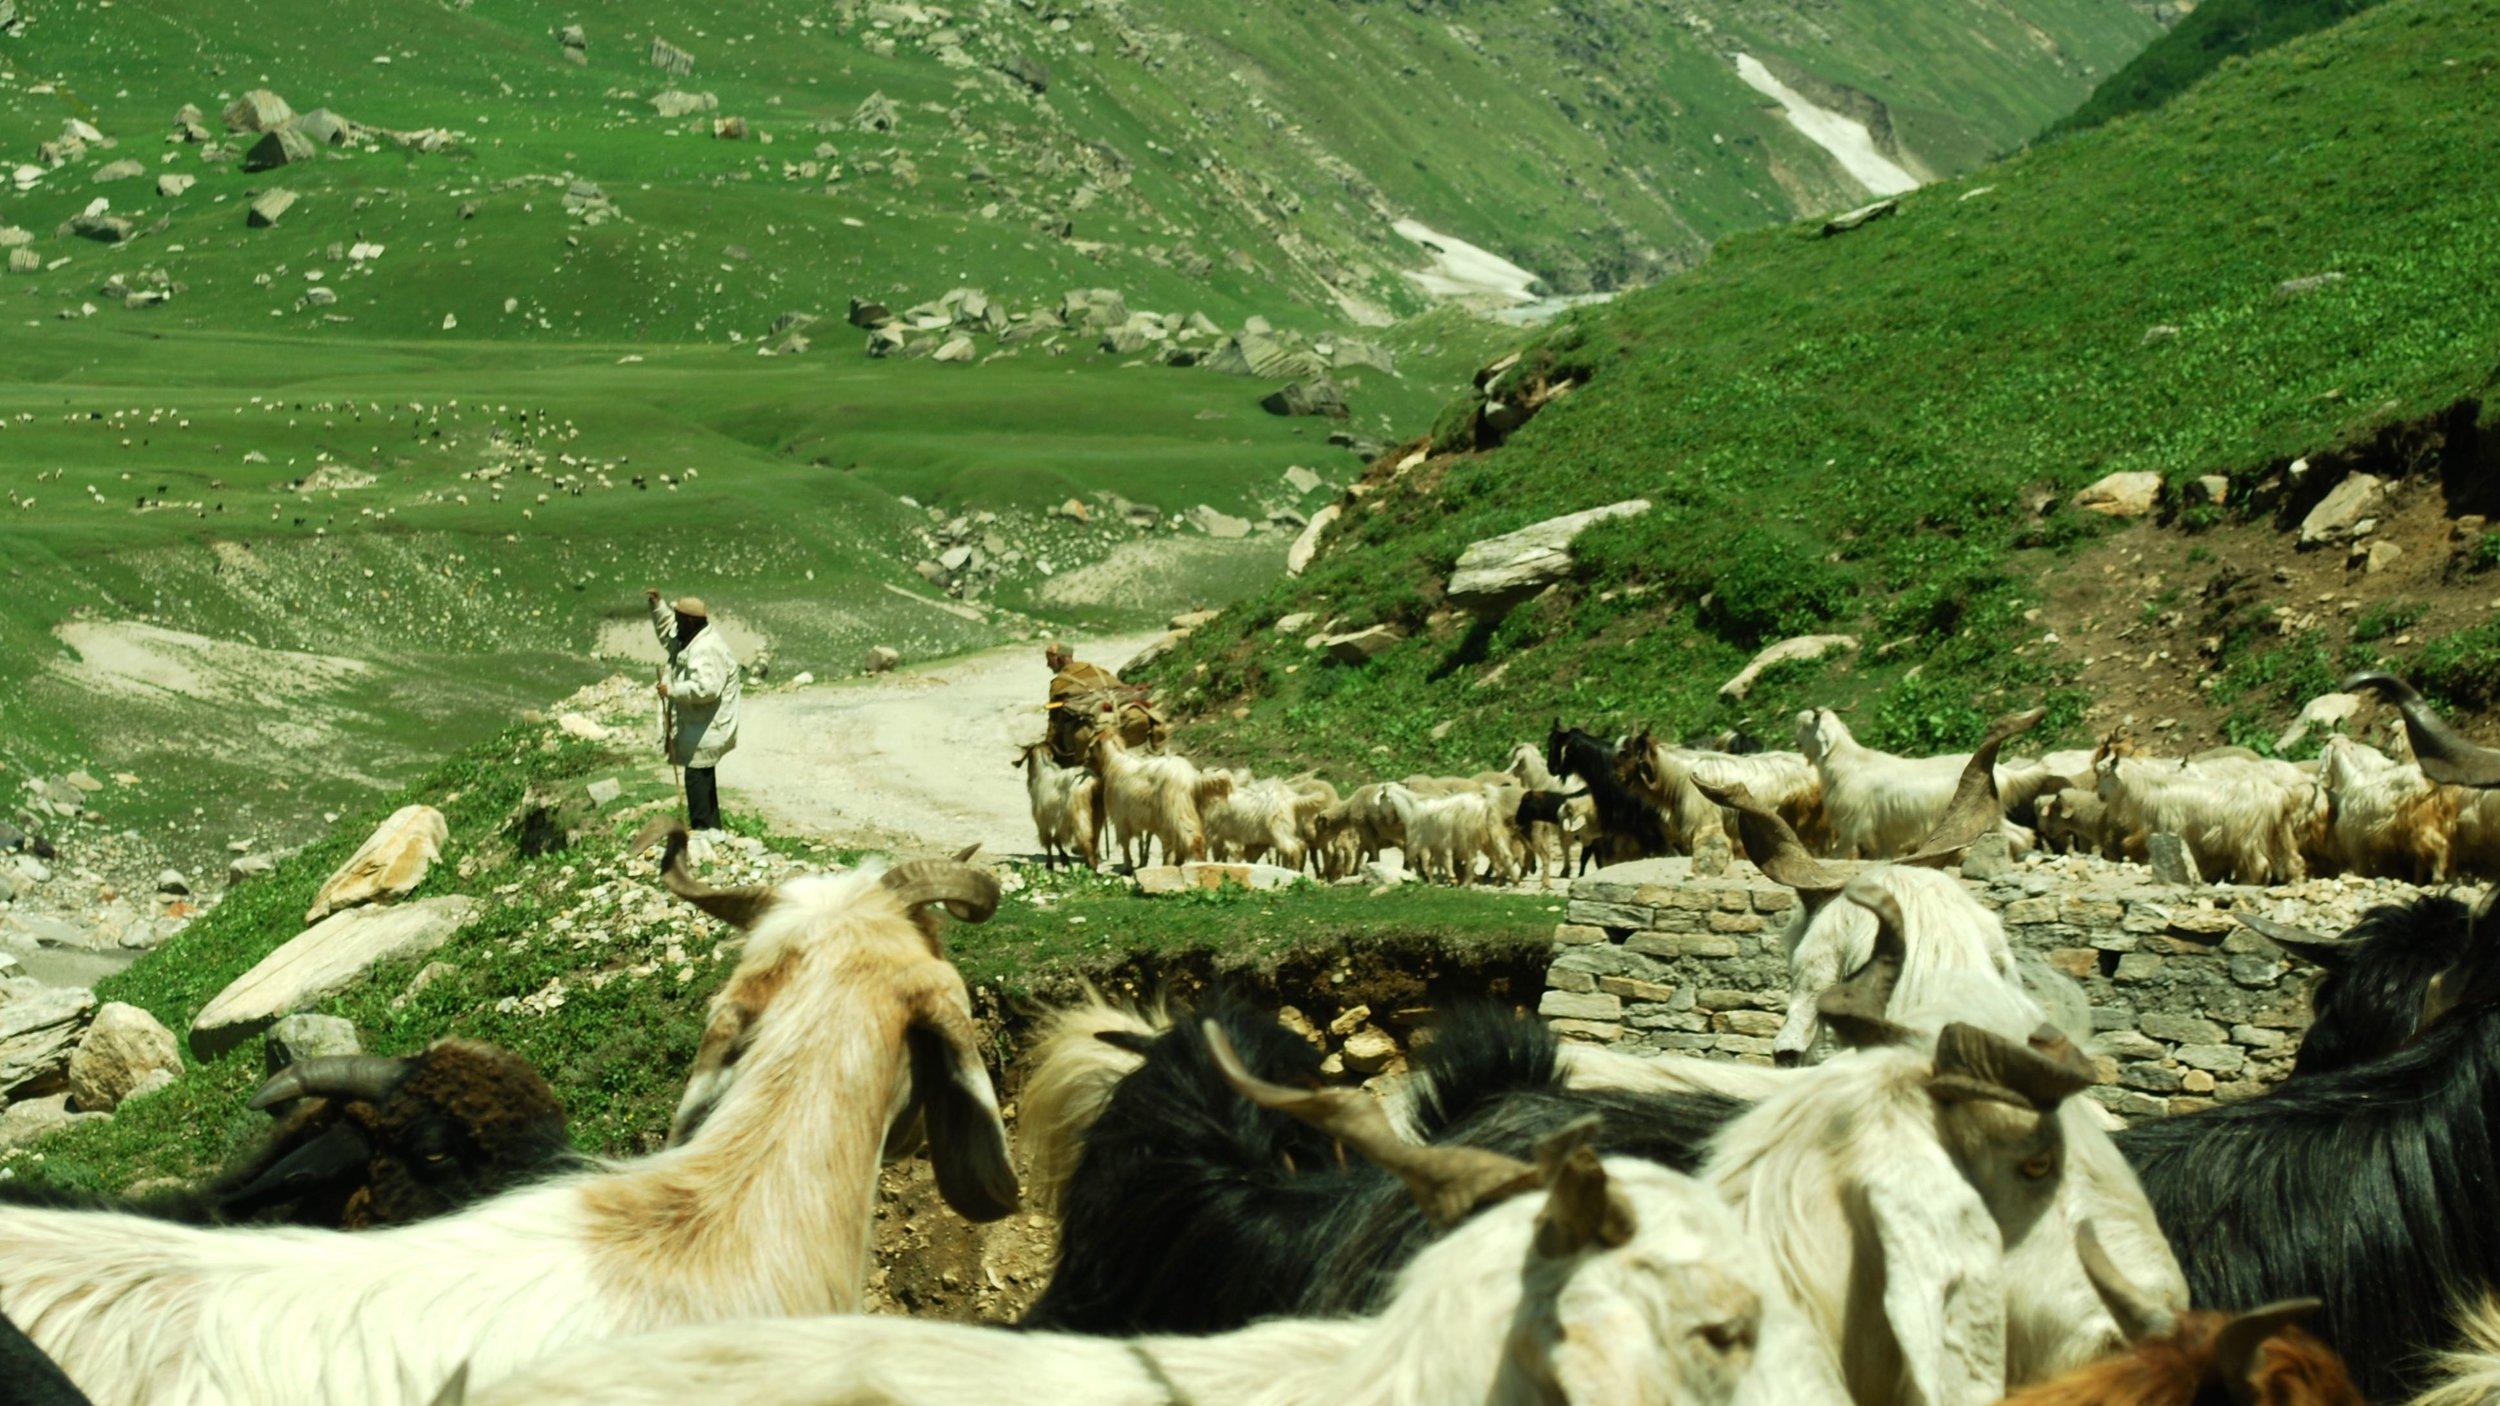 India-Spiti-Manali-road-goats.jpg